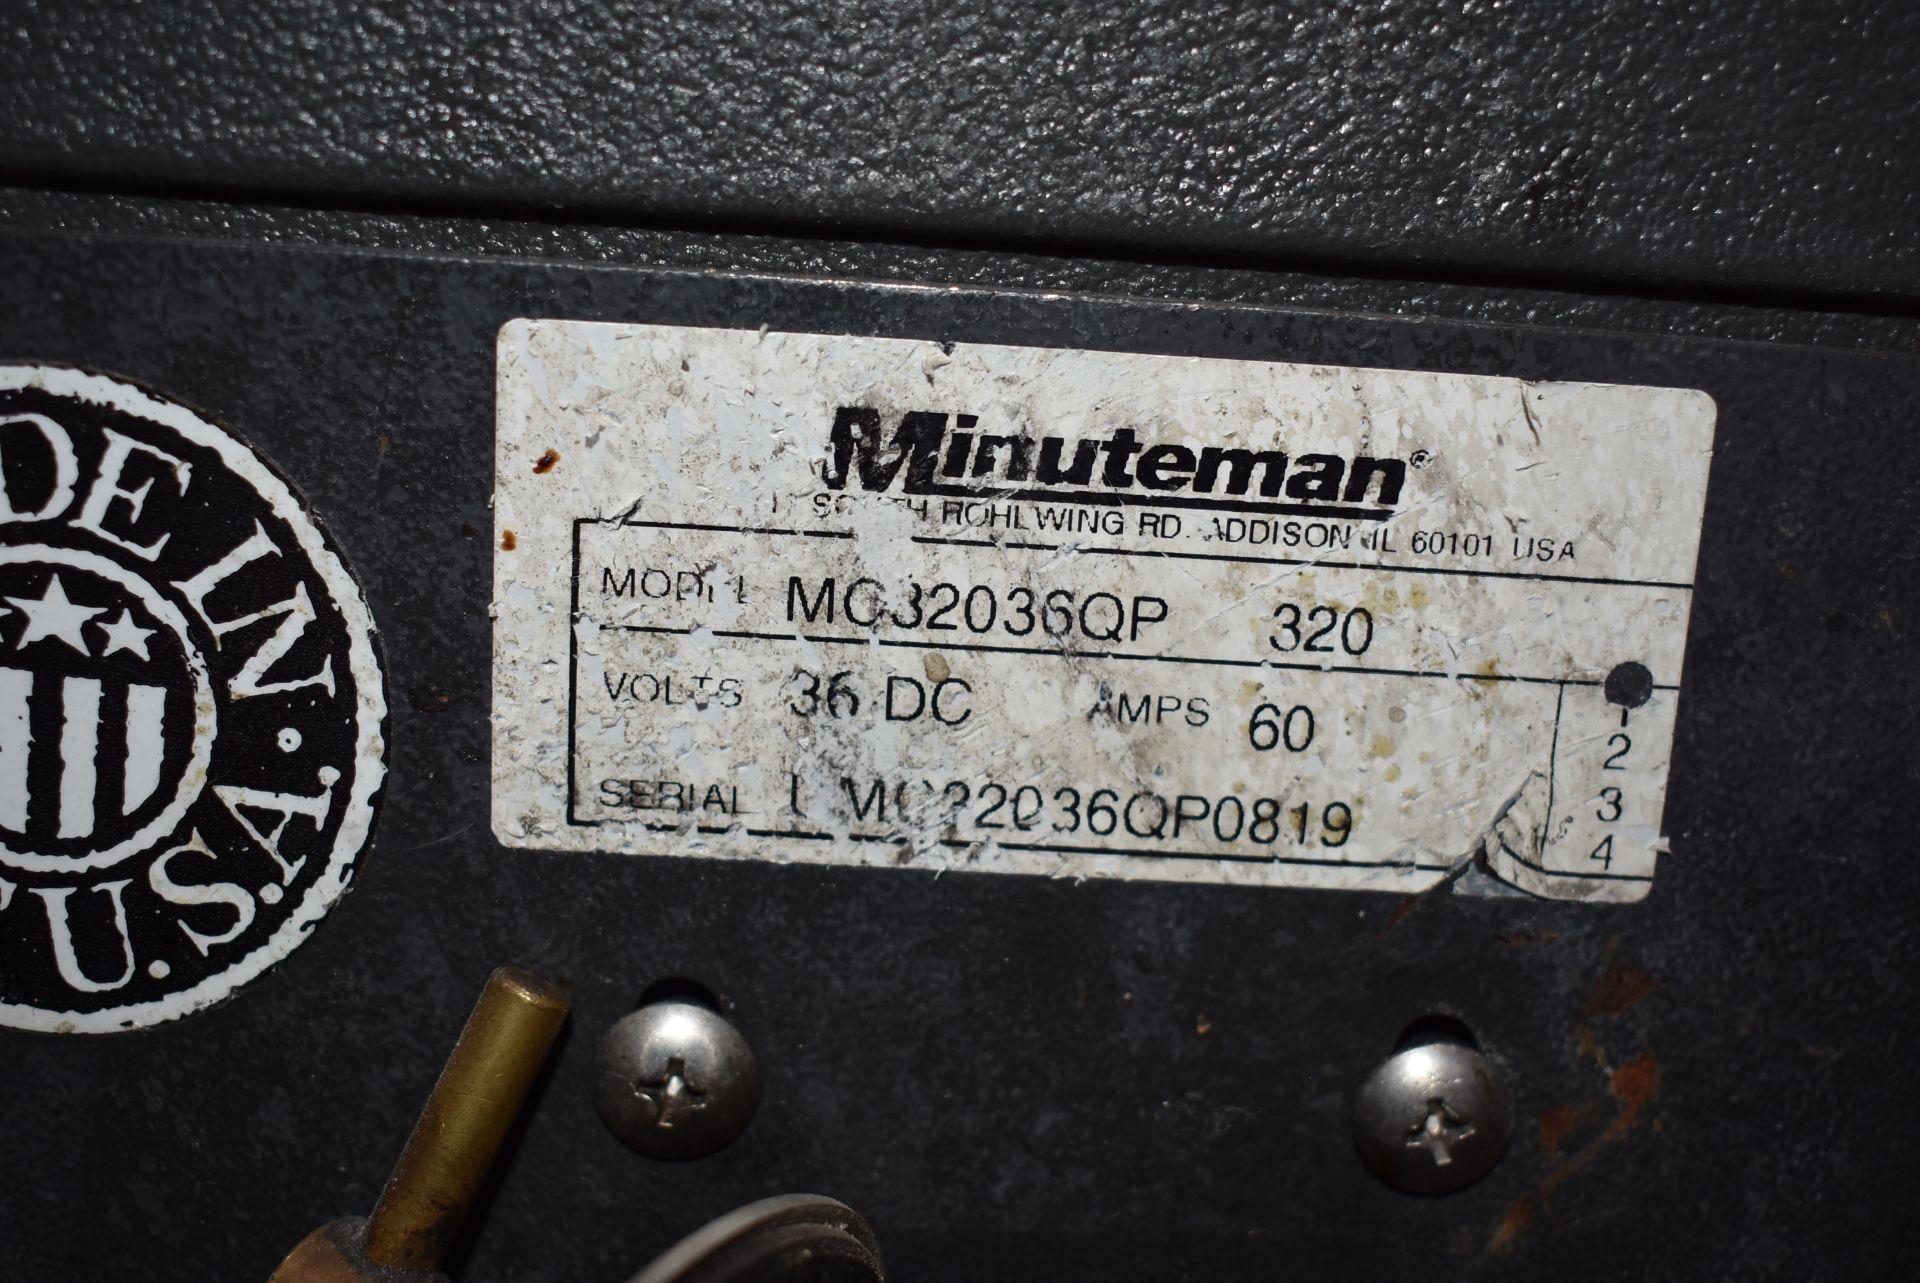 Minuteman Model #MG32036QP Electric Floor Scrubber - Image 2 of 3